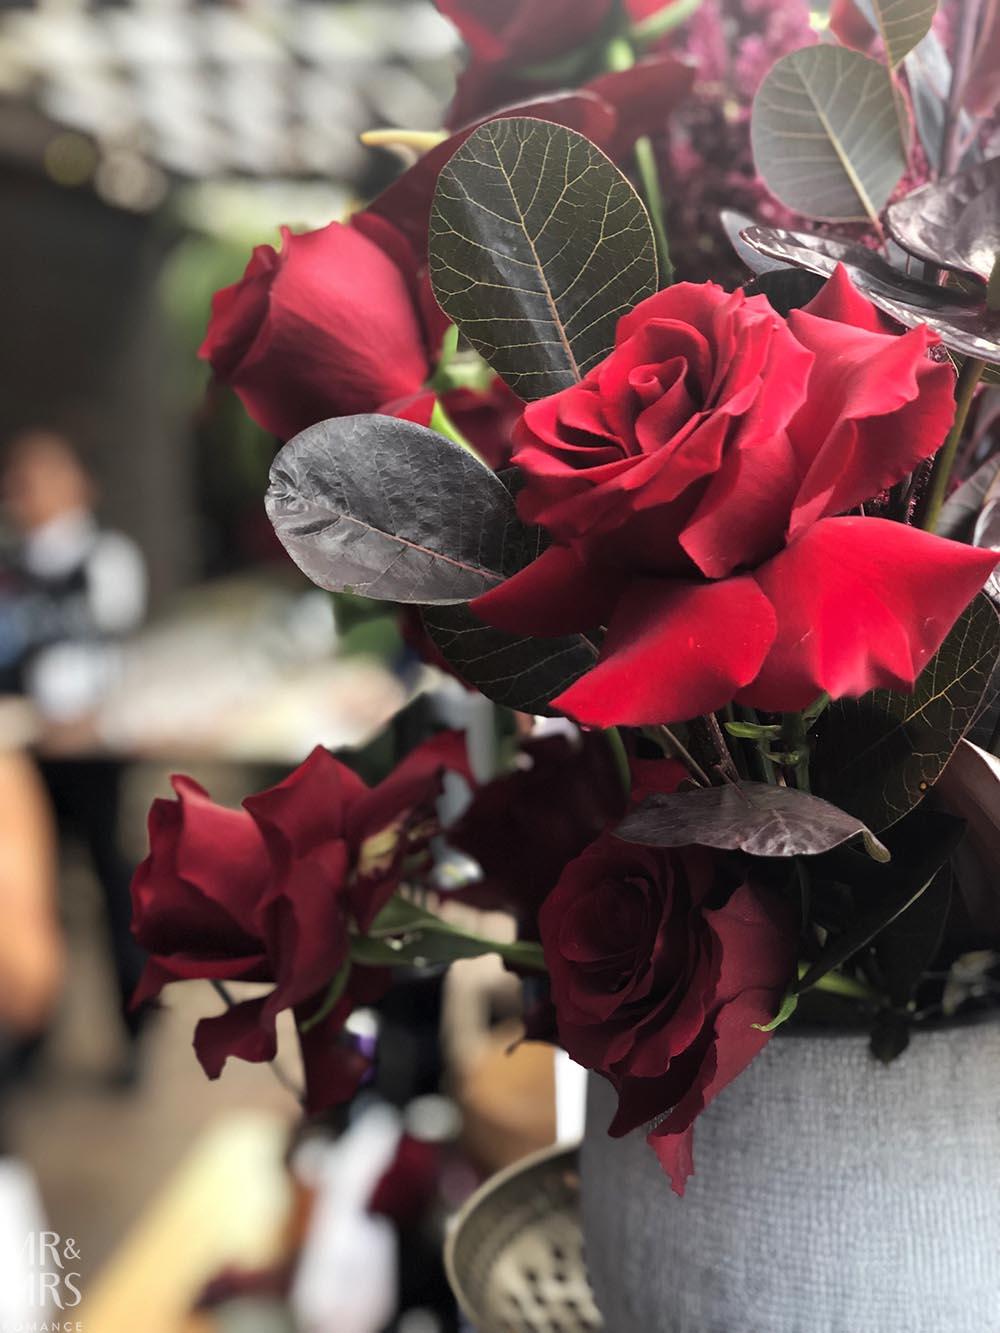 Roses for winter - Pinnacle Drinks